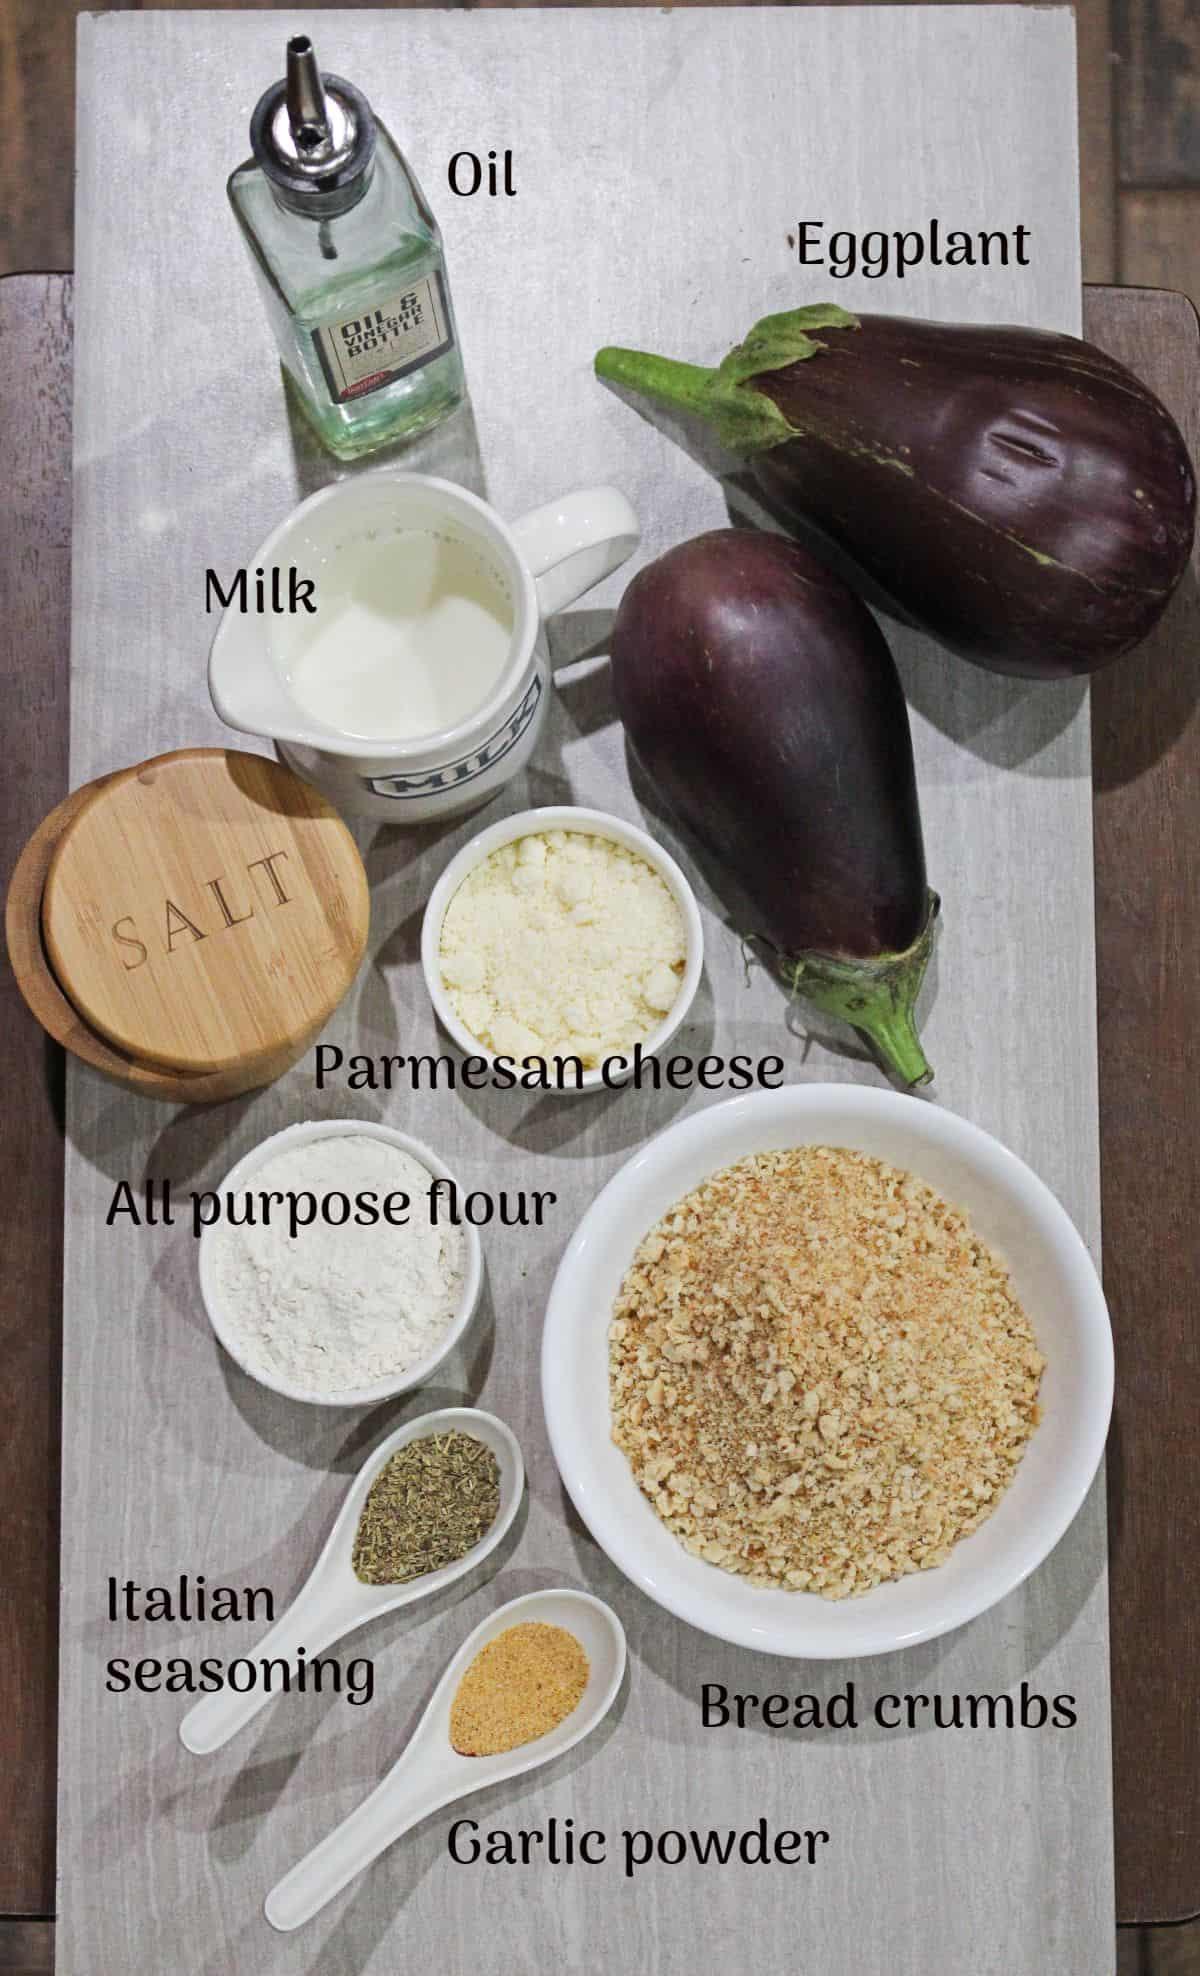 Ingredients needed to make eggplant cutlet